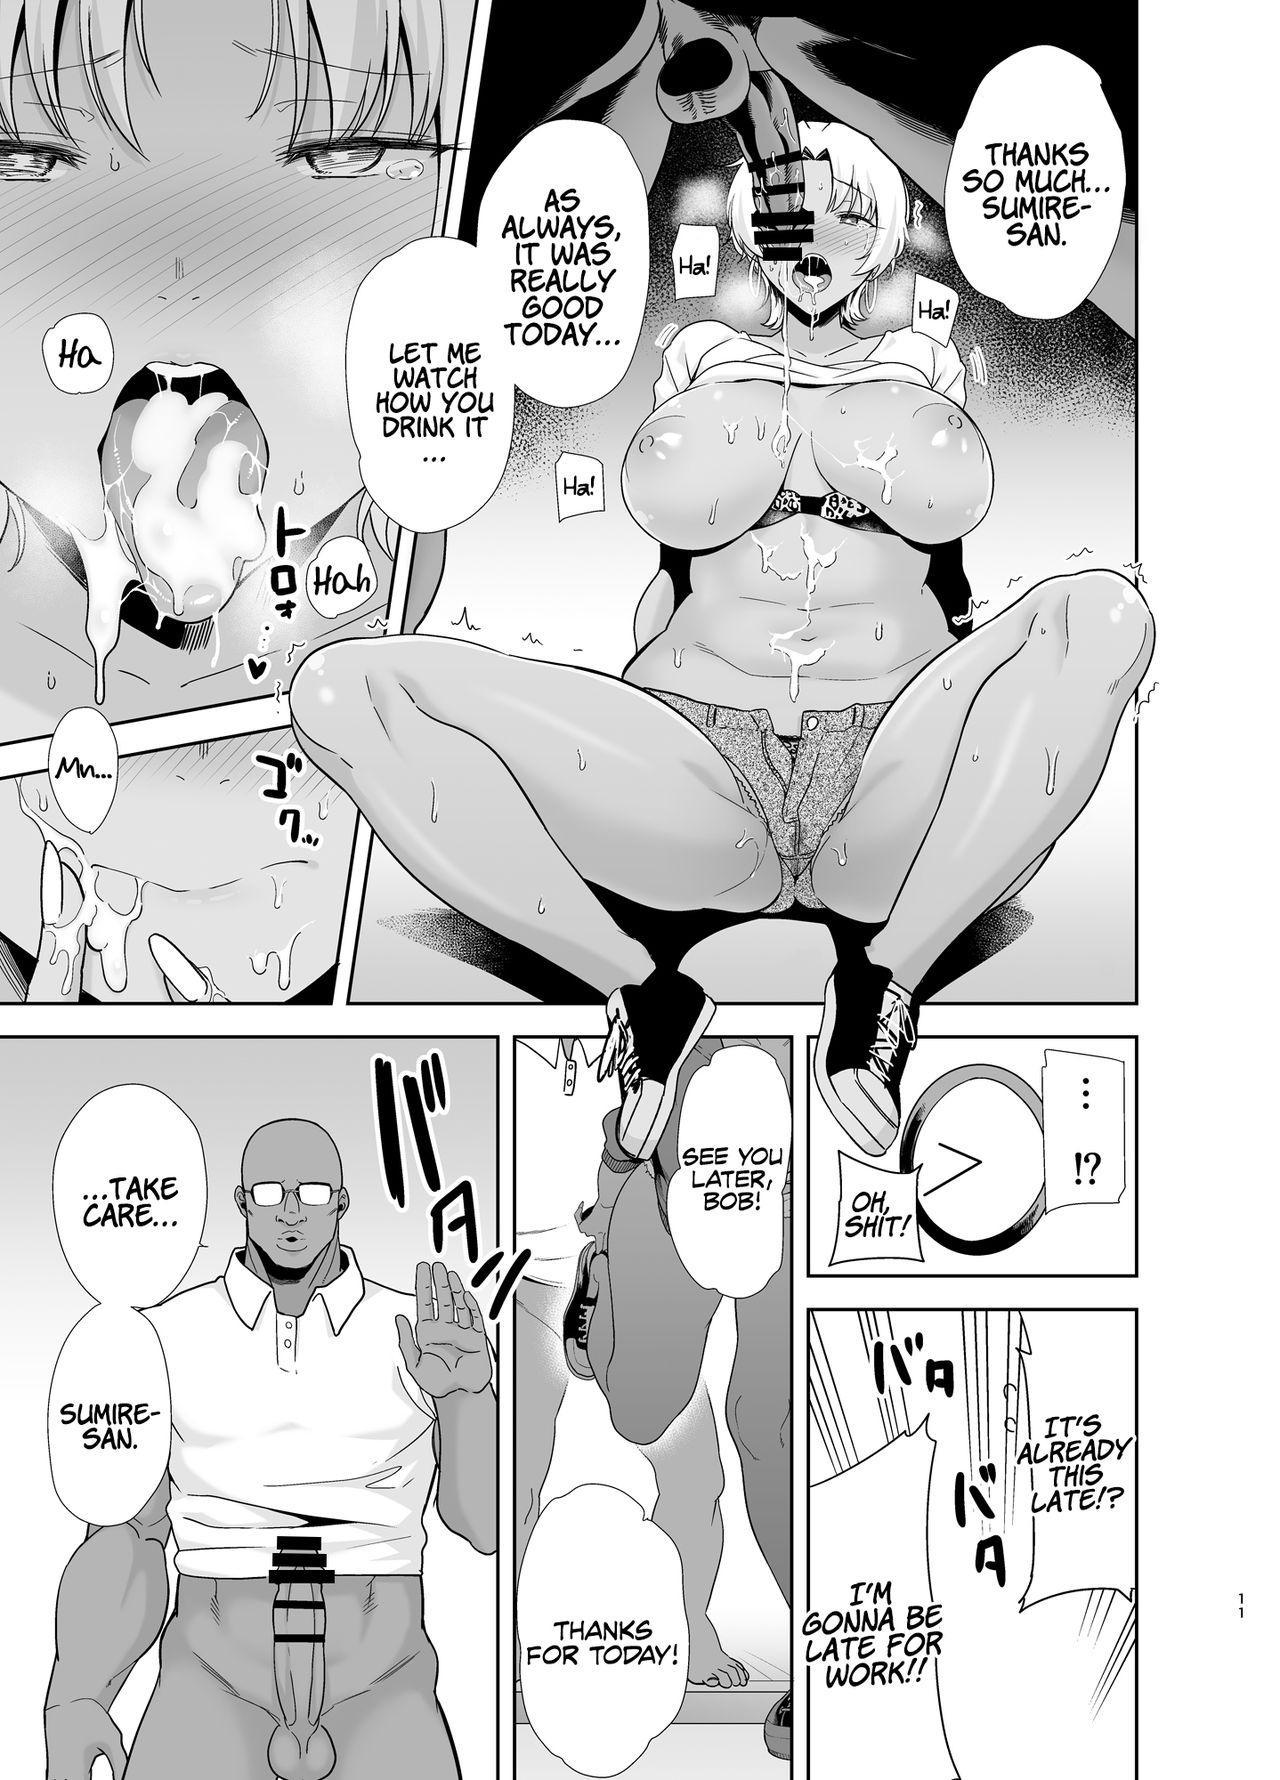 [DOLL PLAY (Kurosu Gatari)] Wild-shiki Nihonjin Tsuma no Netorikata Sono Ni | Wild Method - How to Steal a Japanese Housewife - Part Two [English] [Coffedrug] [Digital] 9